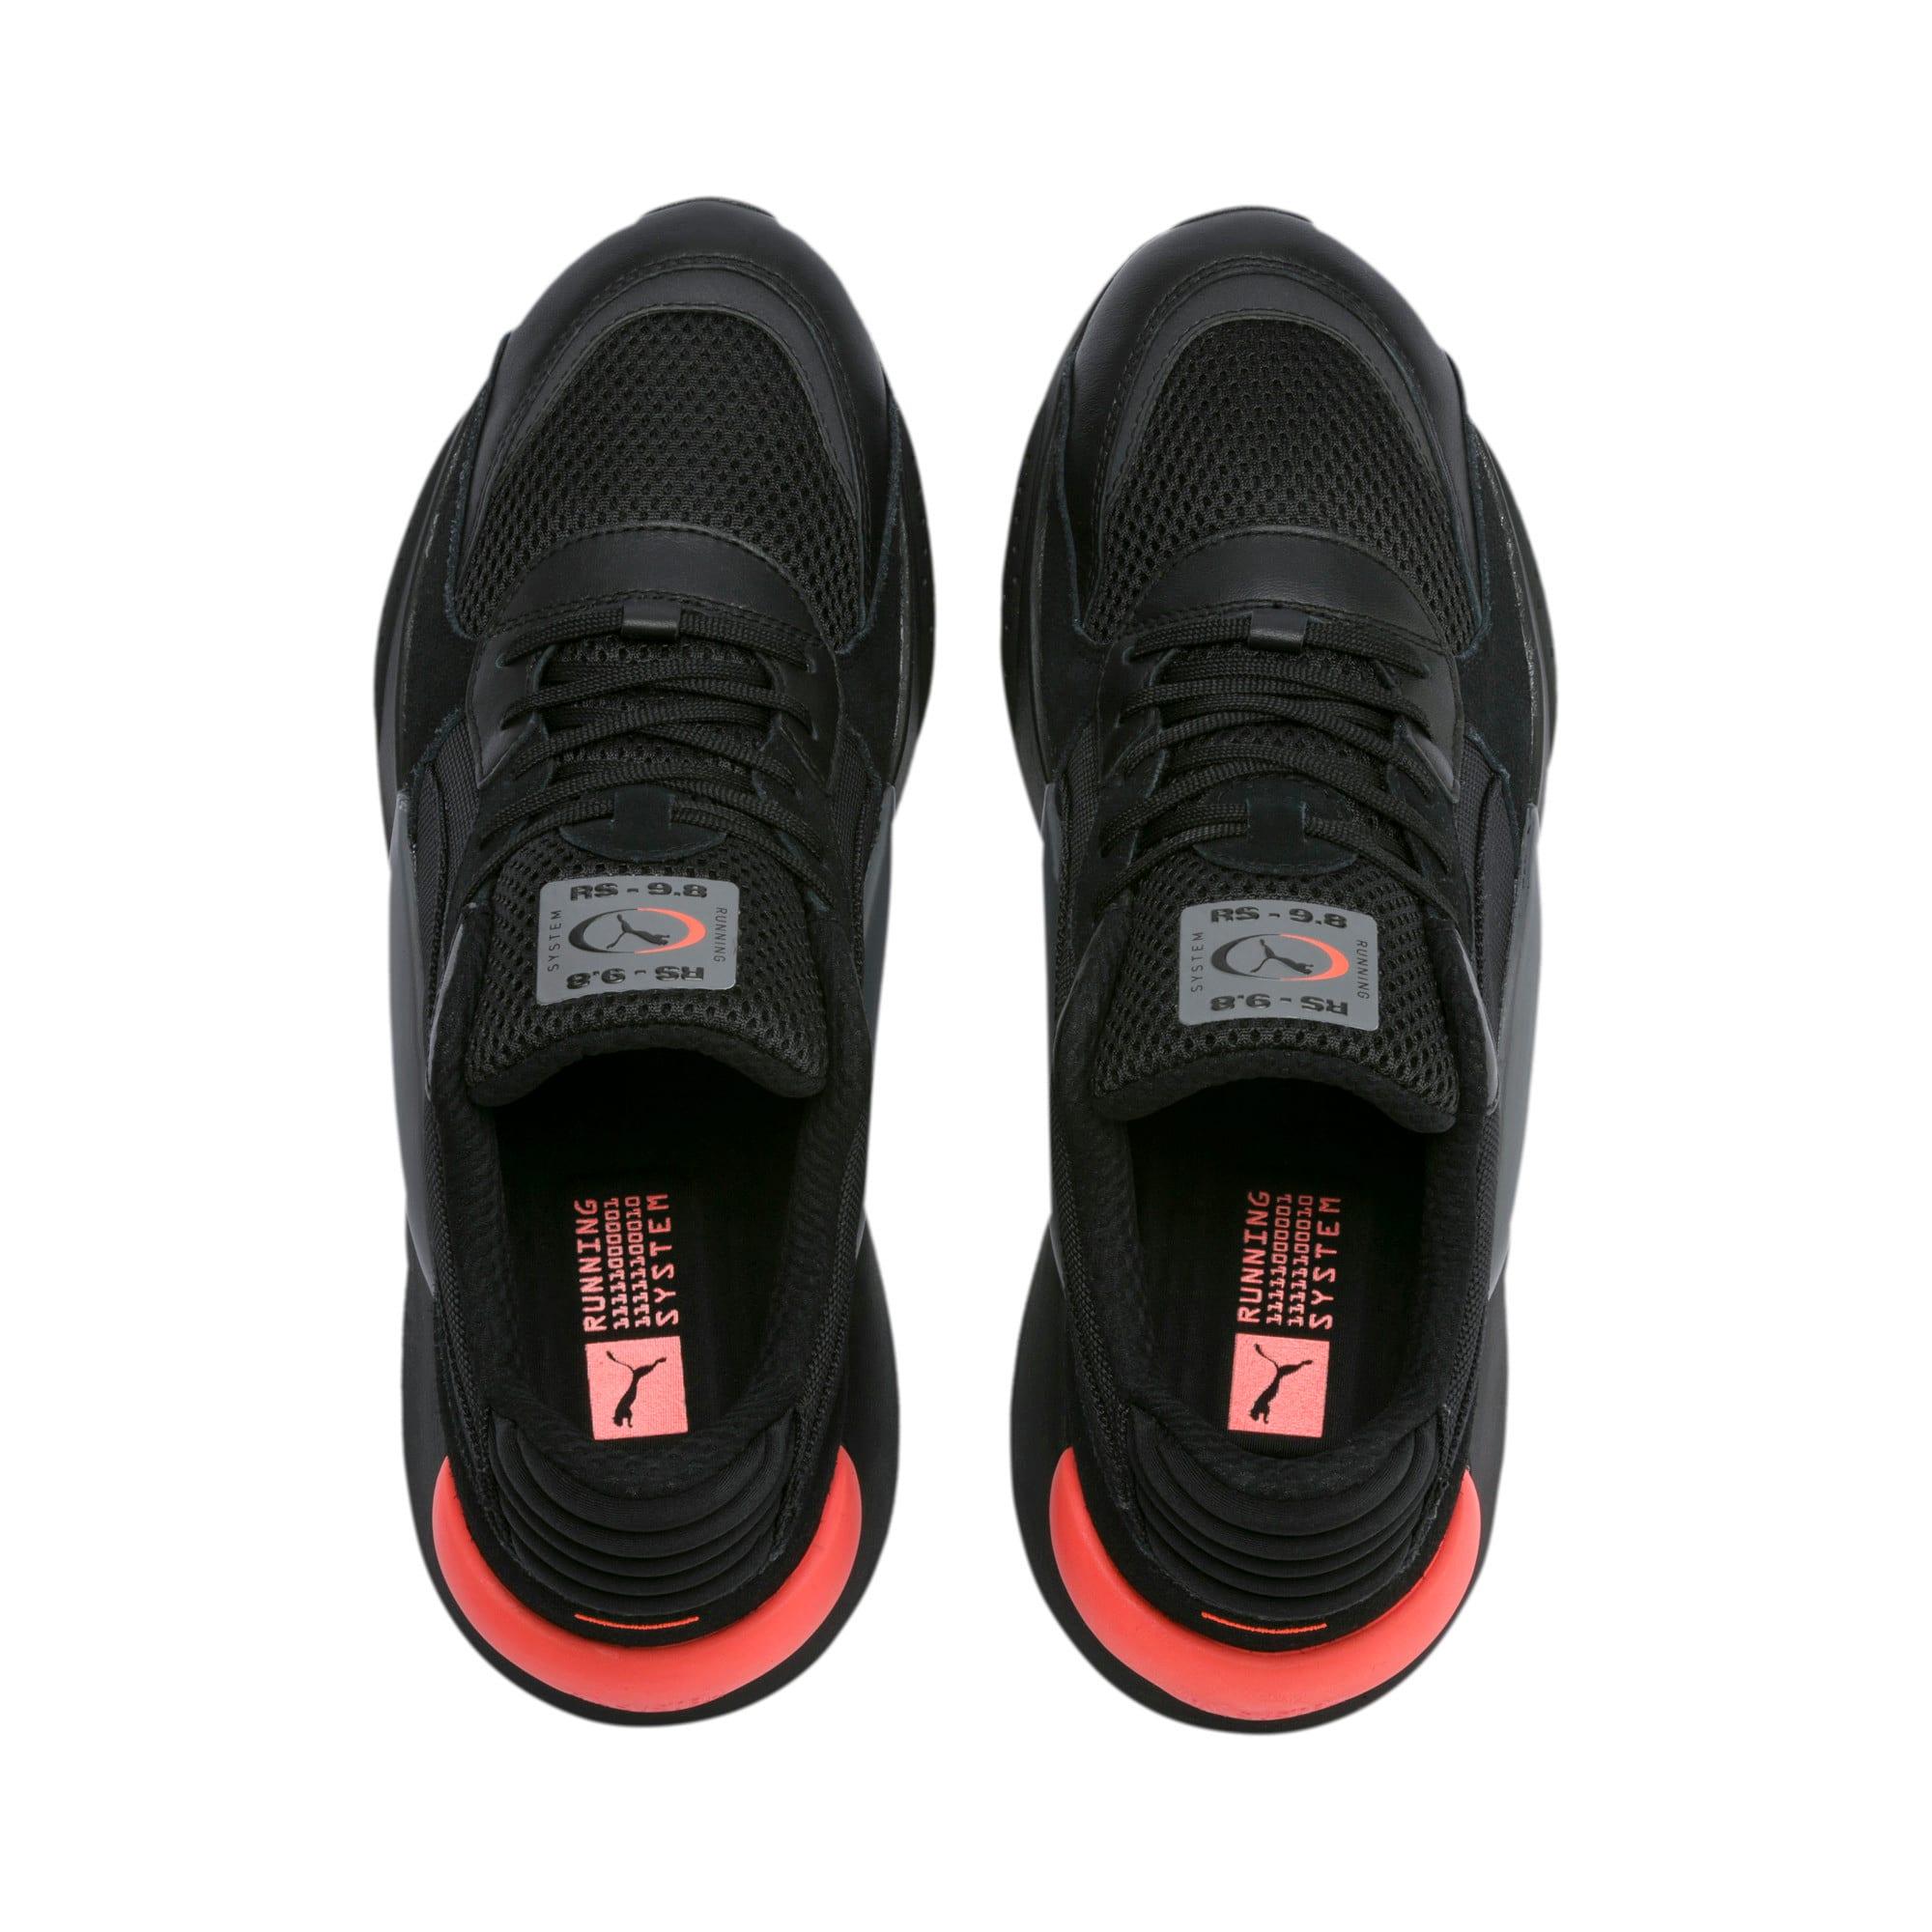 Thumbnail 6 of RS 9.8 Cosmic Sneakers, Puma Black, medium